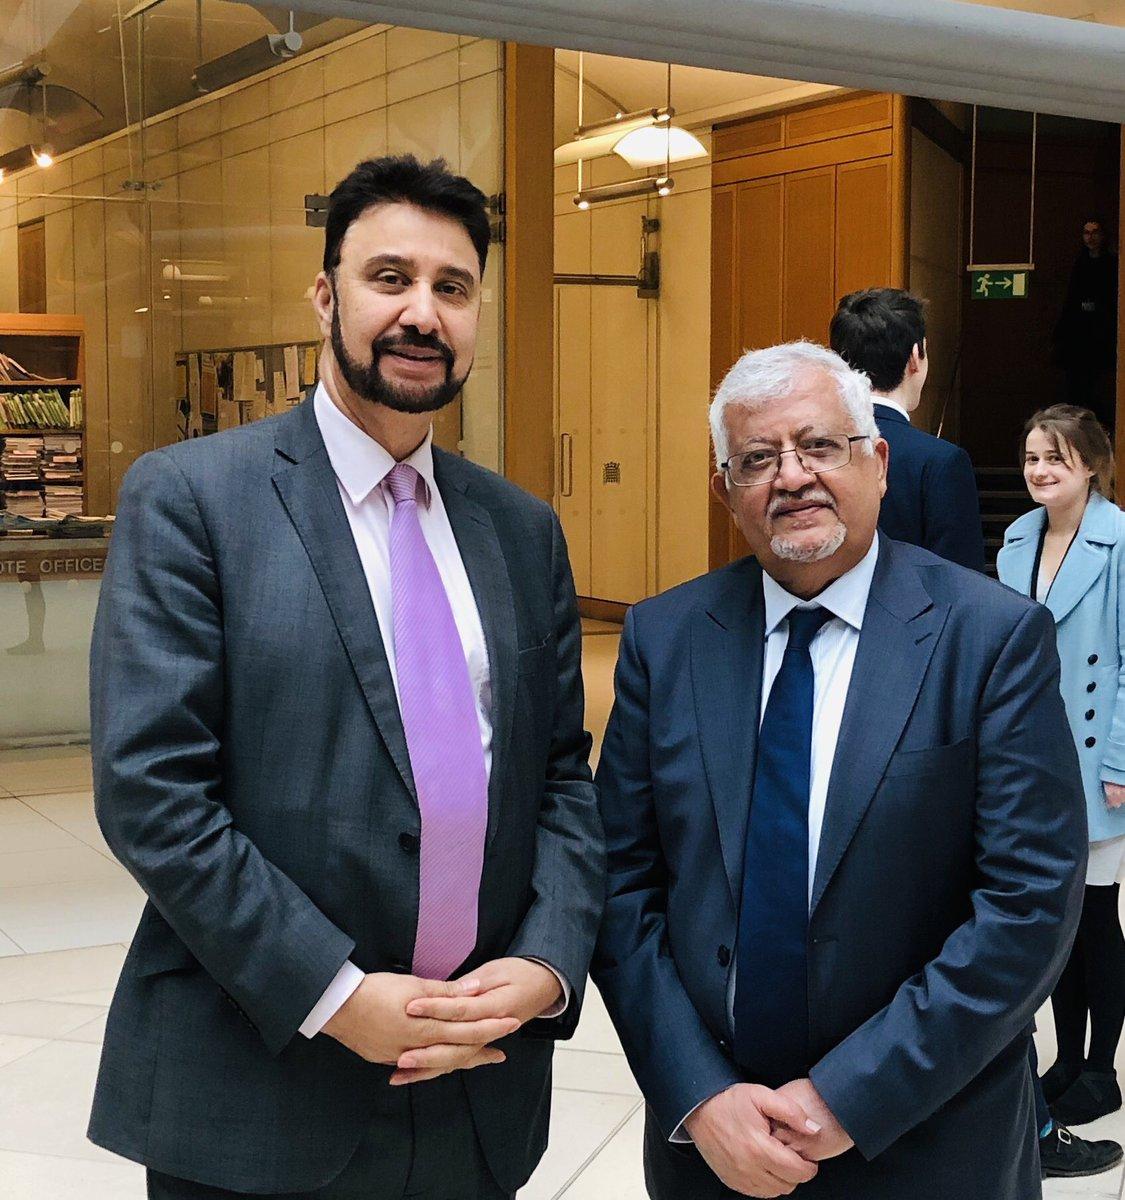 Yemen Embassy London's photo on Yassin